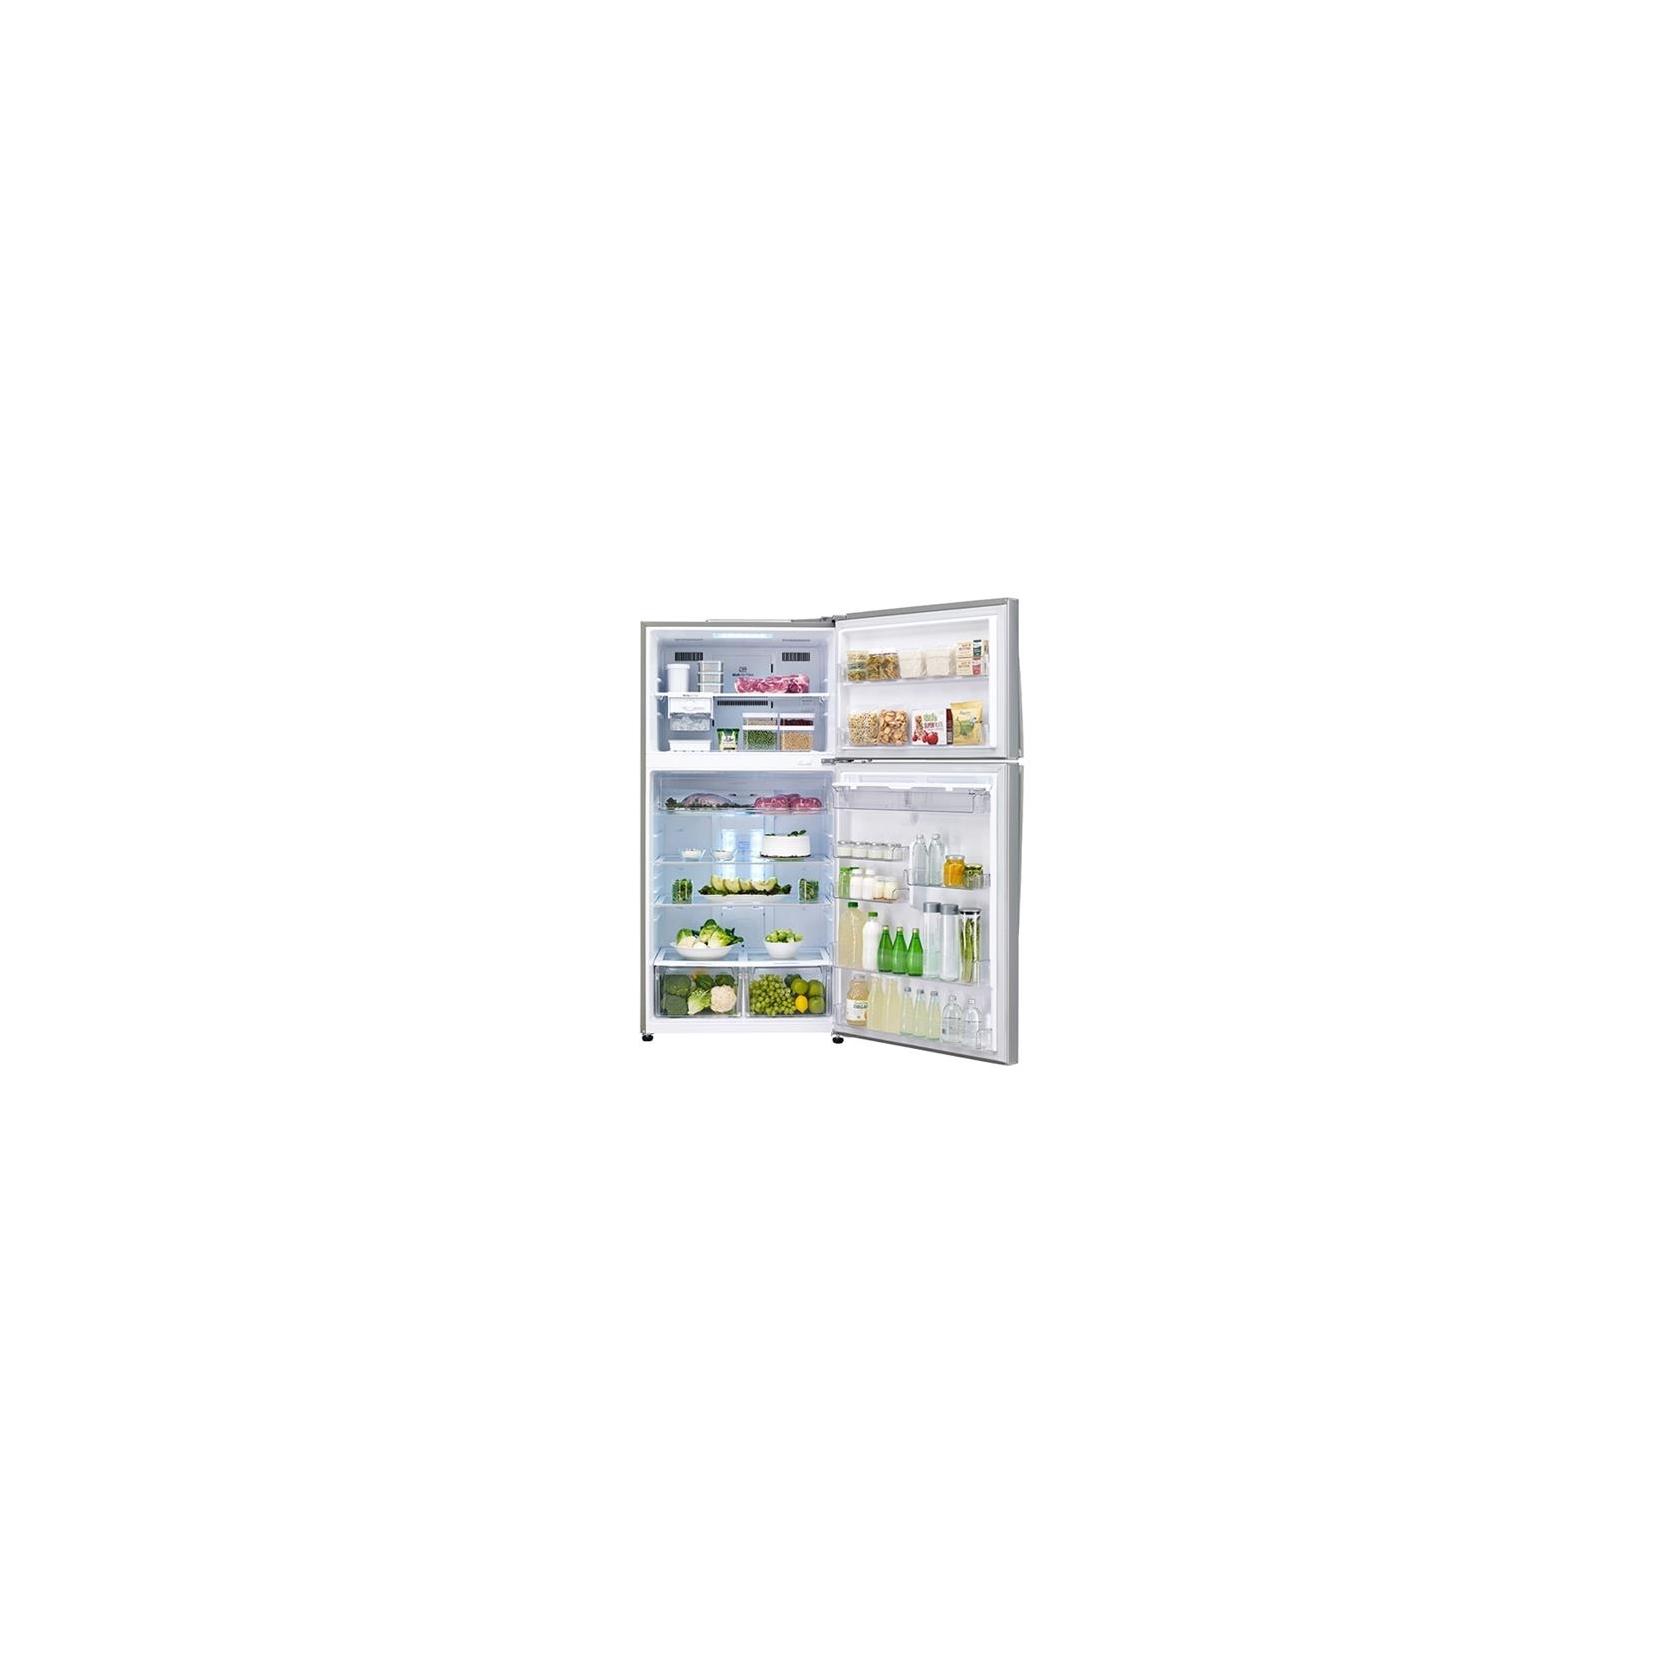 Lg frigorifero doppia porta gtf925sepzd total no frost wi fi classe a colore sabbia garanzia - Frigoriferi doppia porta classe a ...